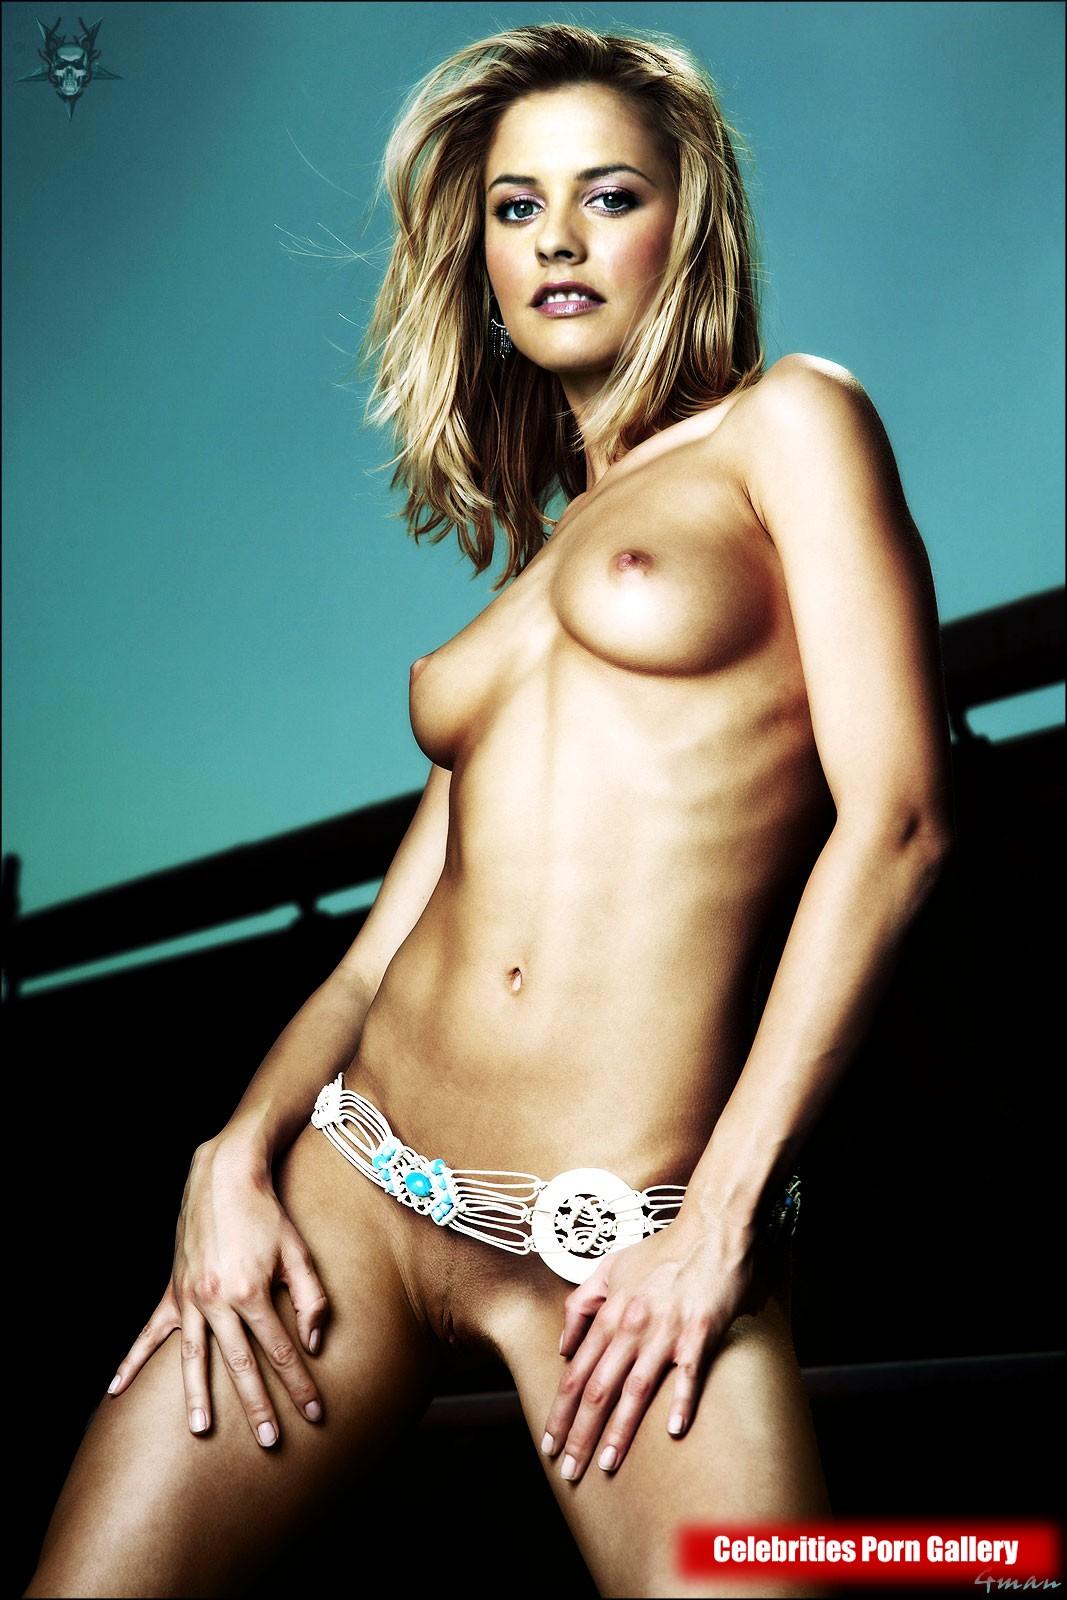 Sheryl Crow Nude Pic